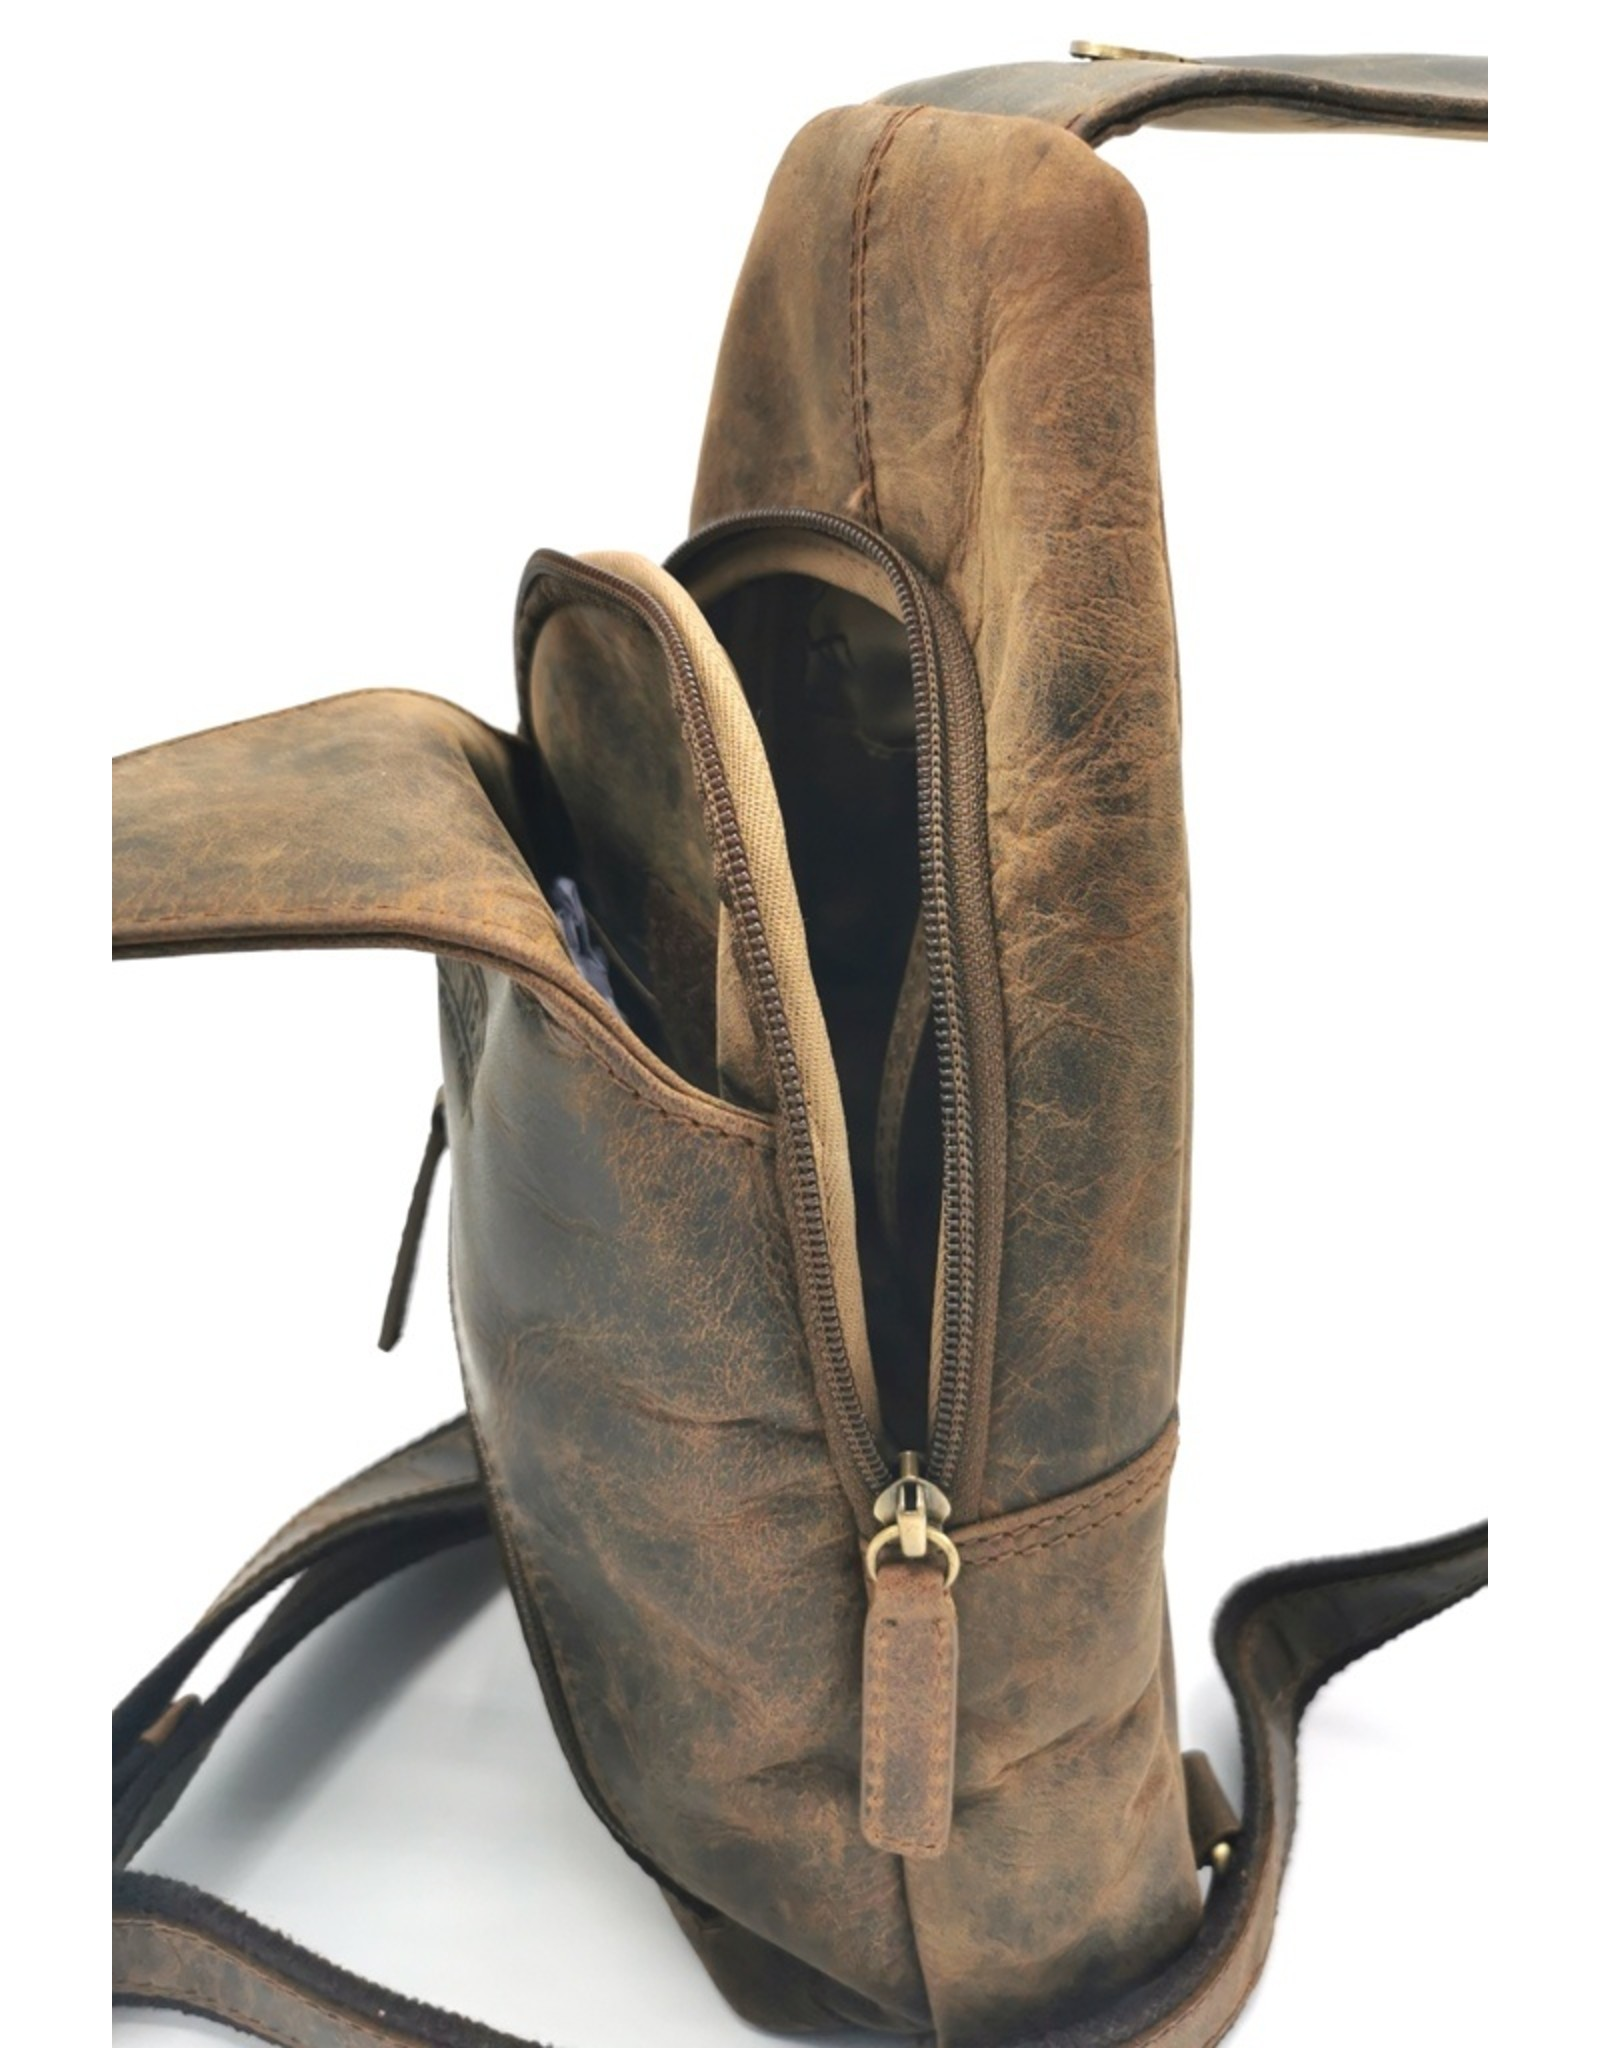 Hunter Leather Shoulder bags  Leather crossbody bags - Hunters Crossbody-Sling bag (dark tan)